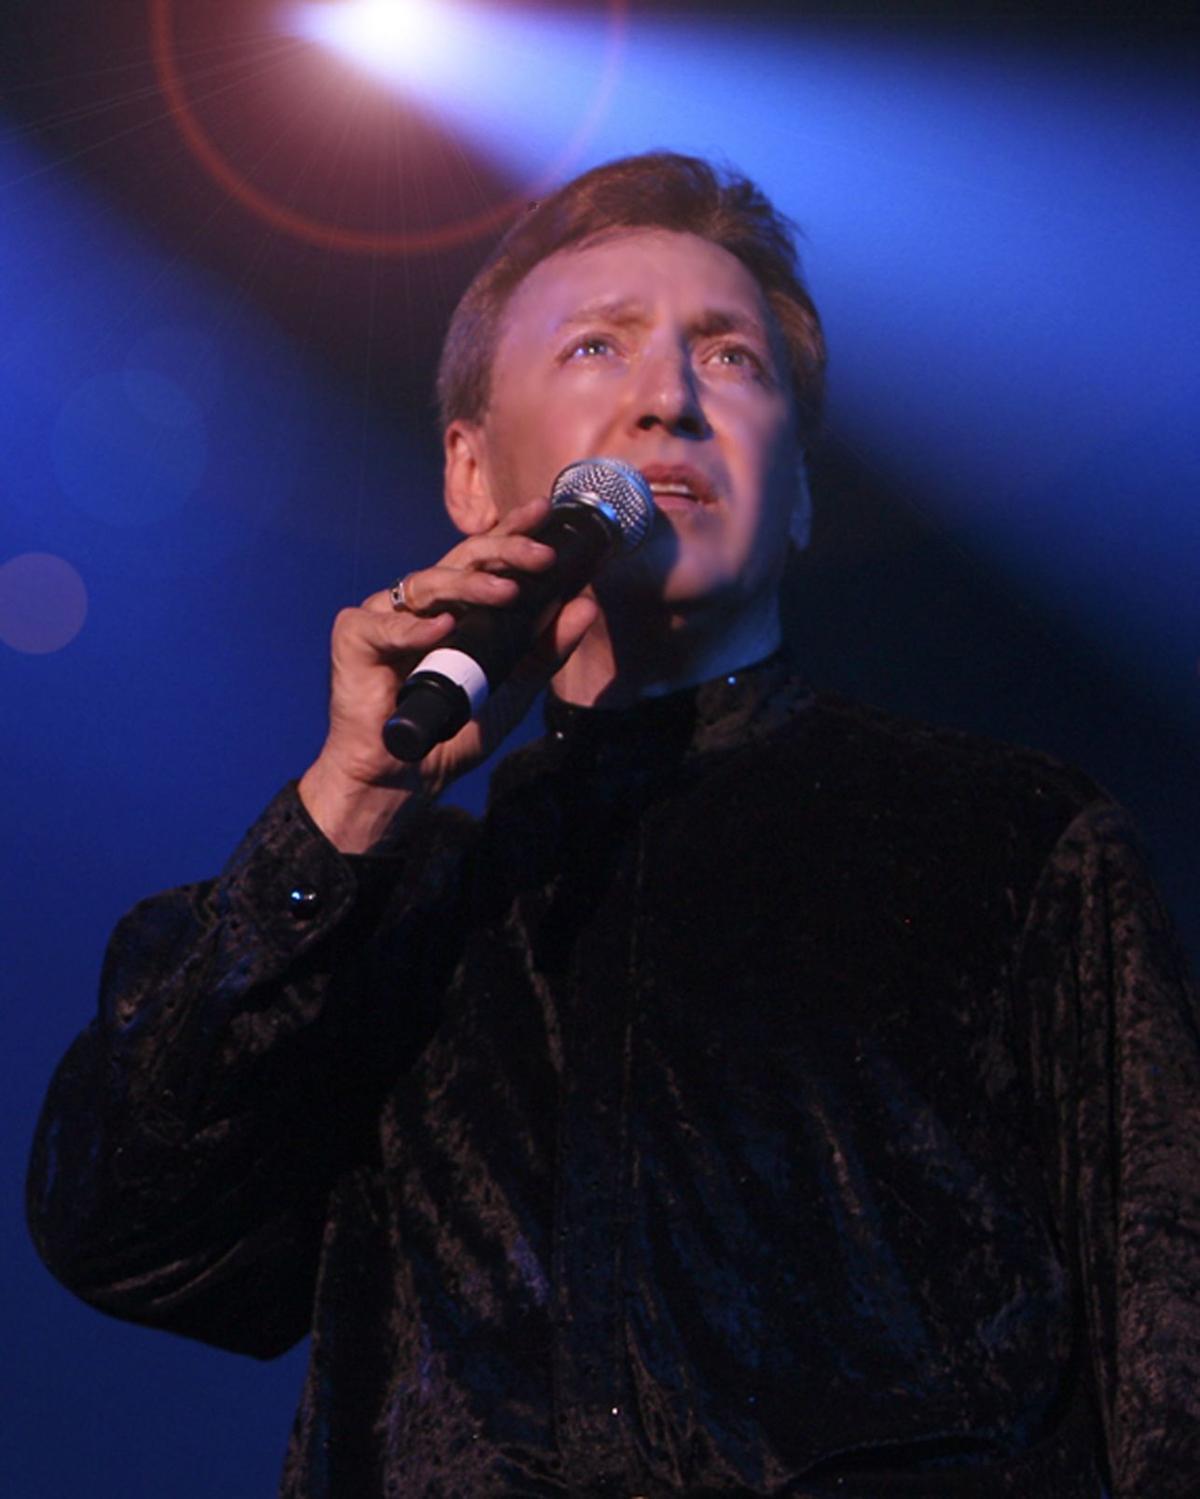 Burnt Store Presbyterian Church announces plans for the 2019 concert series